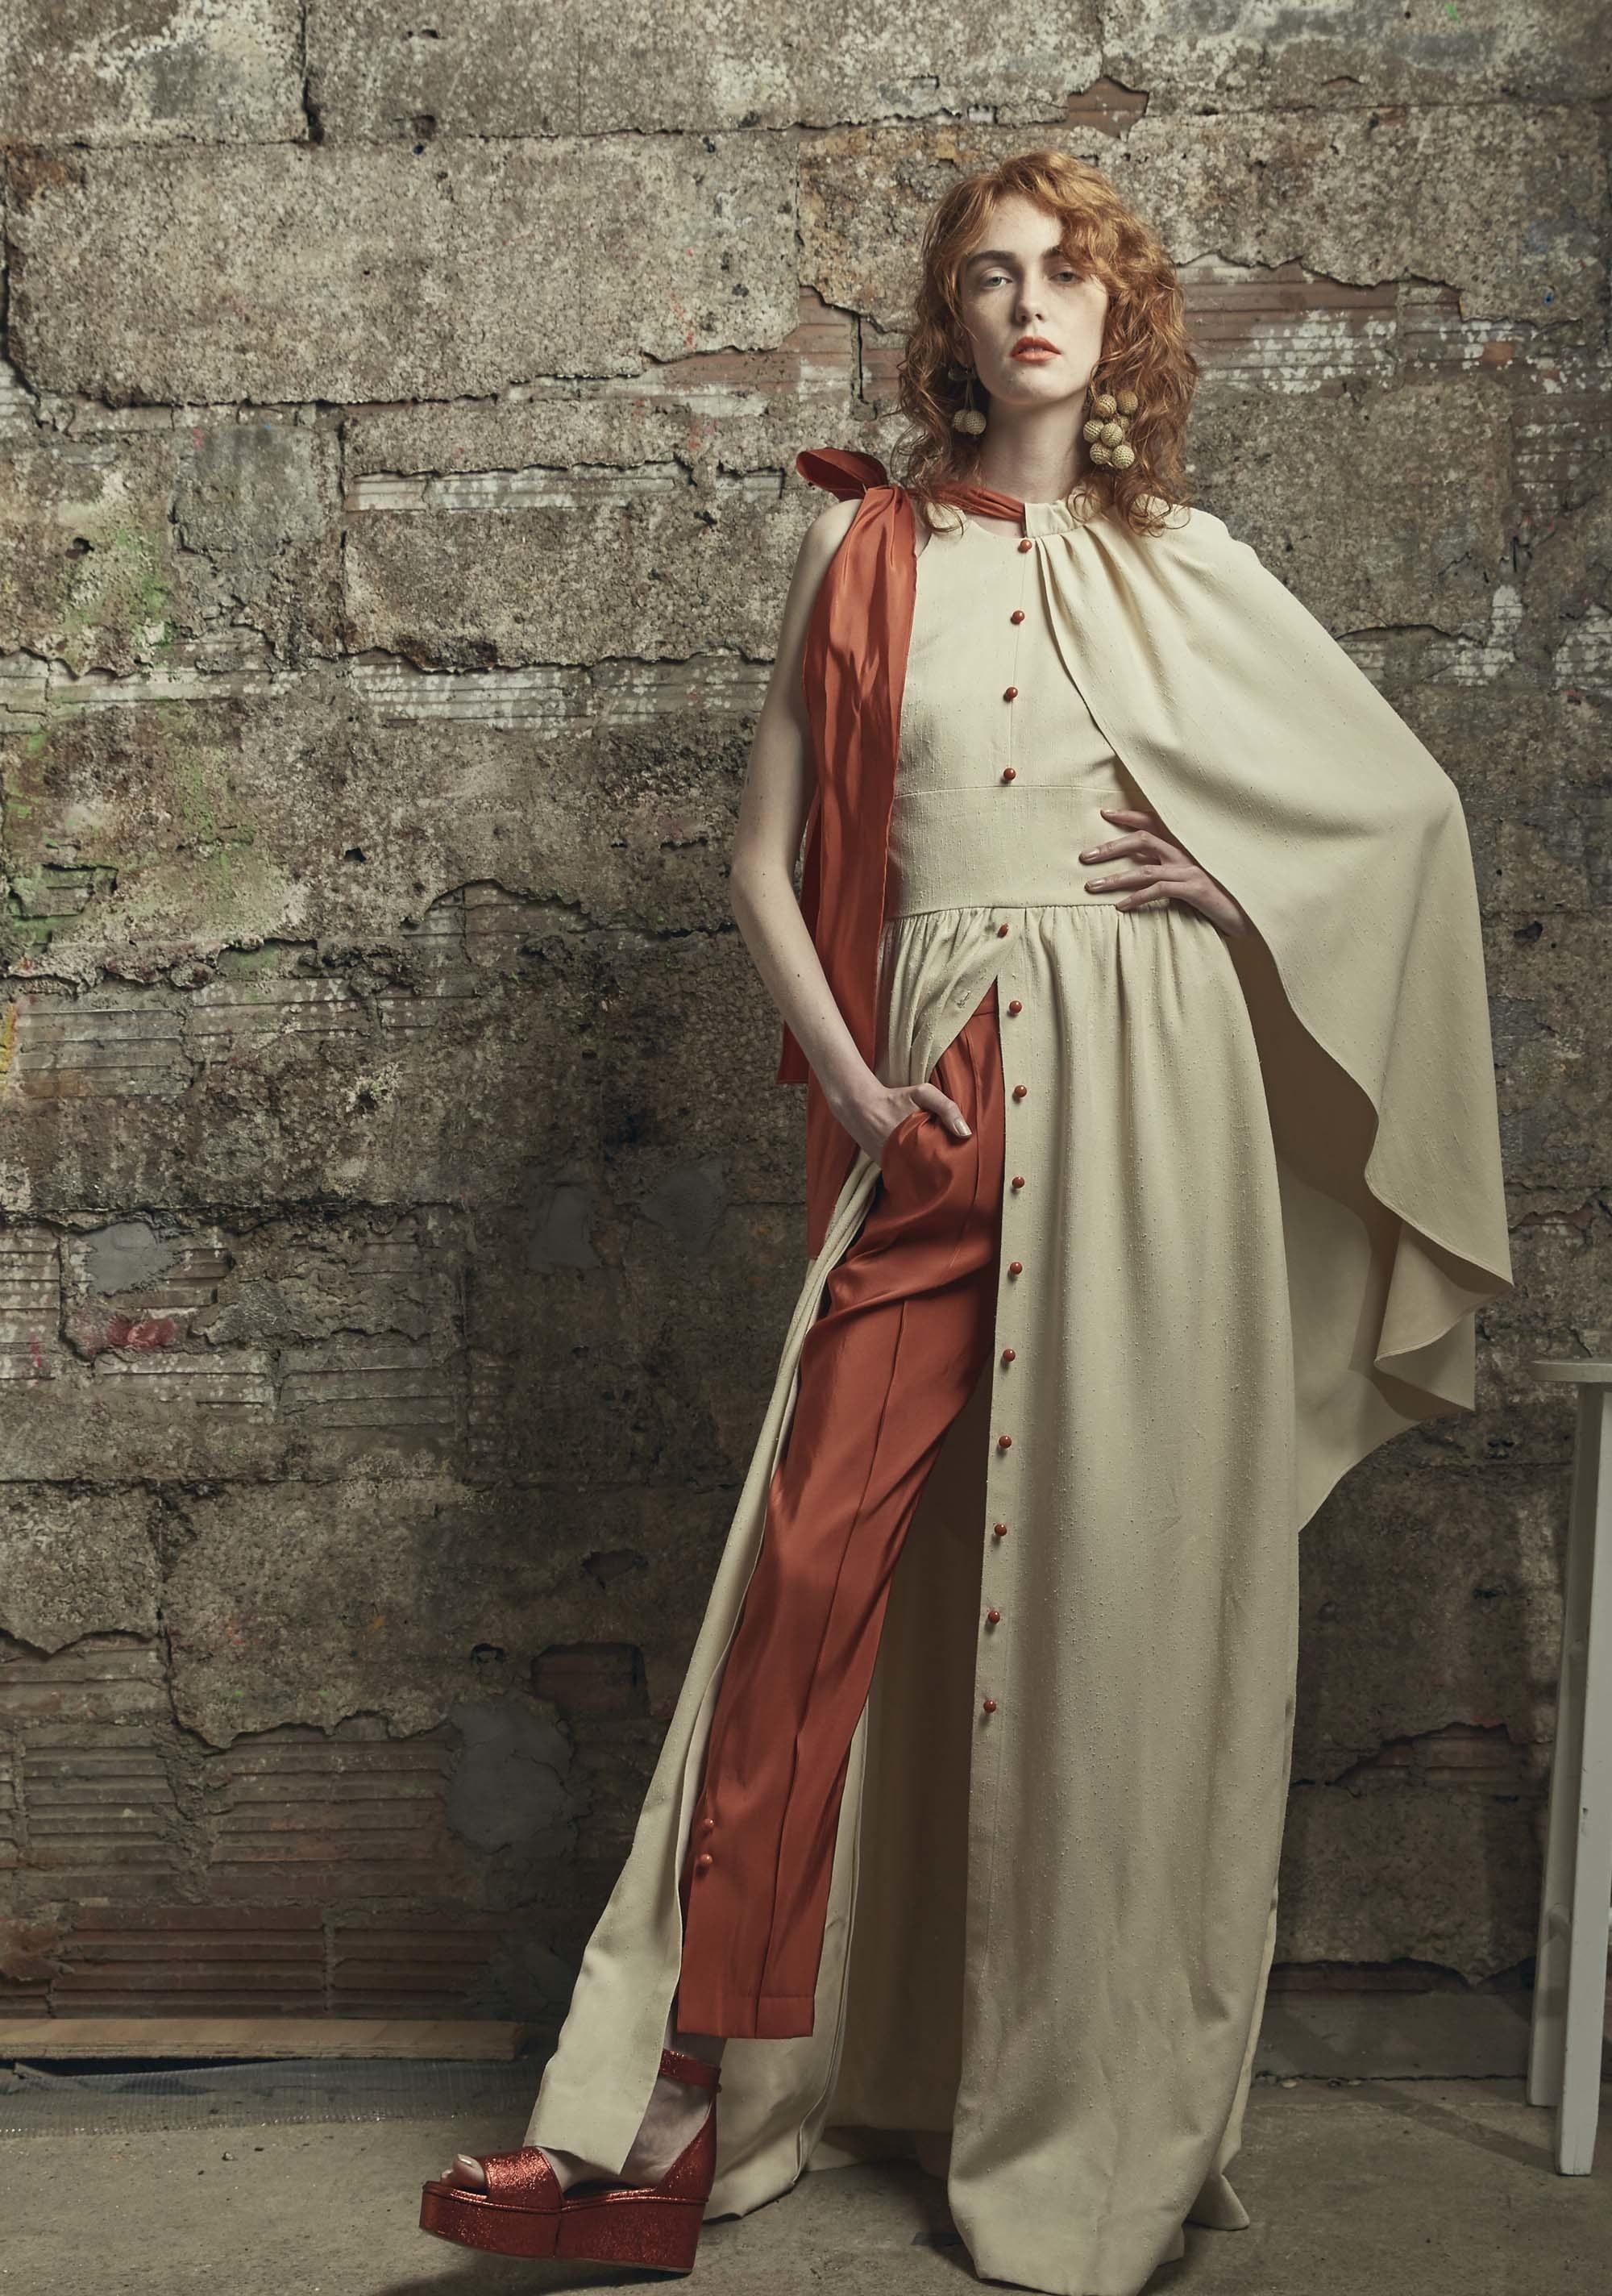 Dress by Design Residence